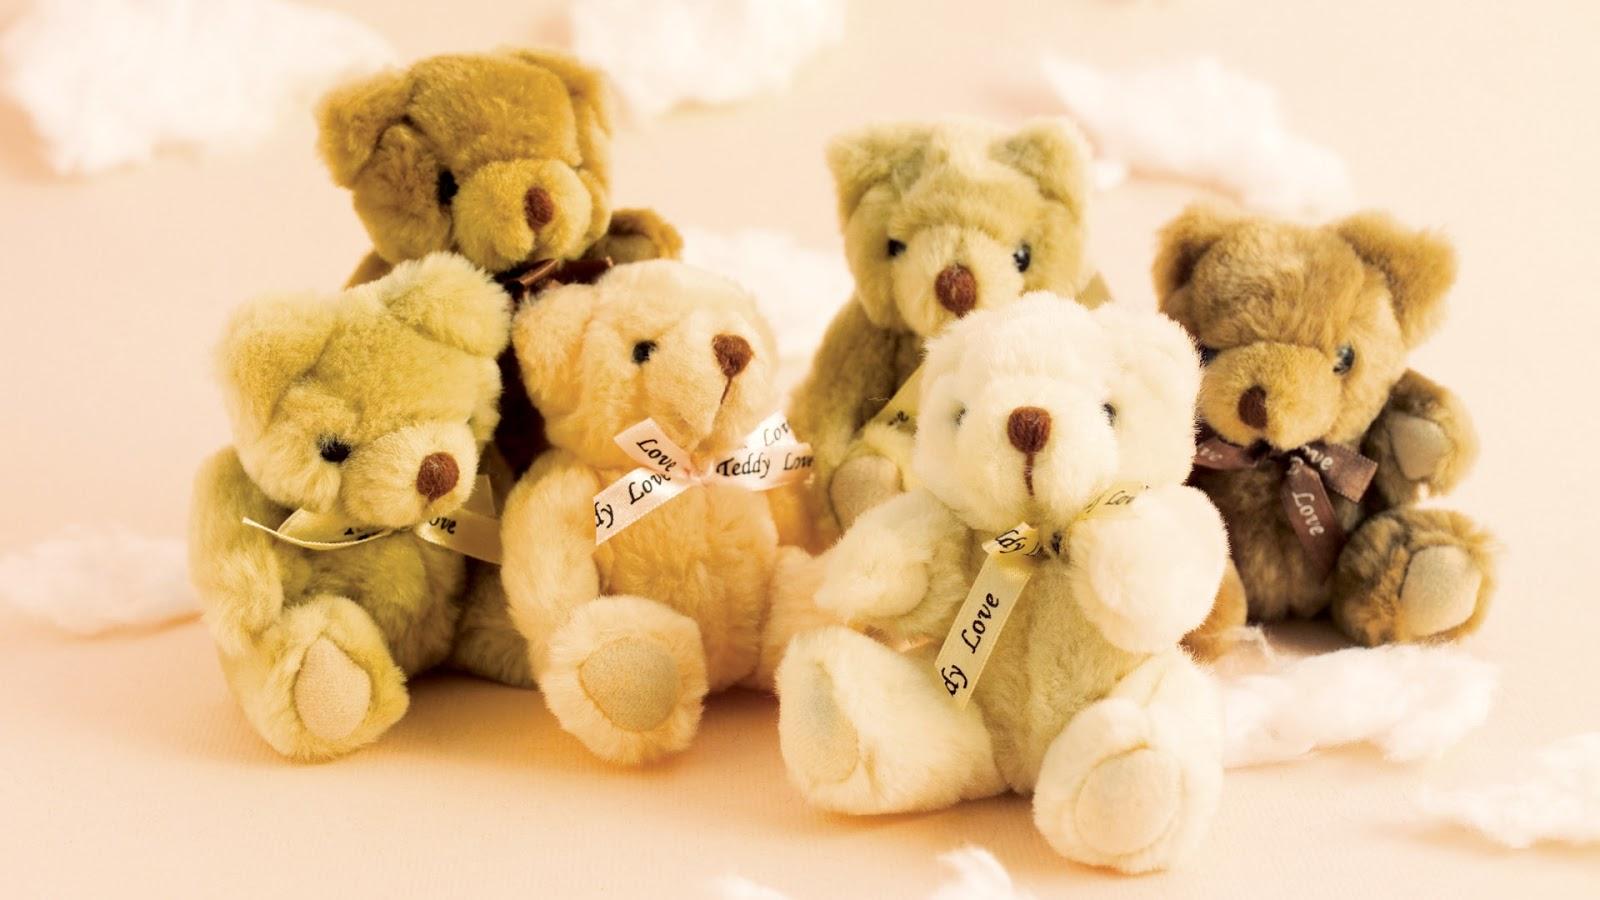 3d Wallpapers Friends Forever Love Teddy Bear Mystery Wallpaper